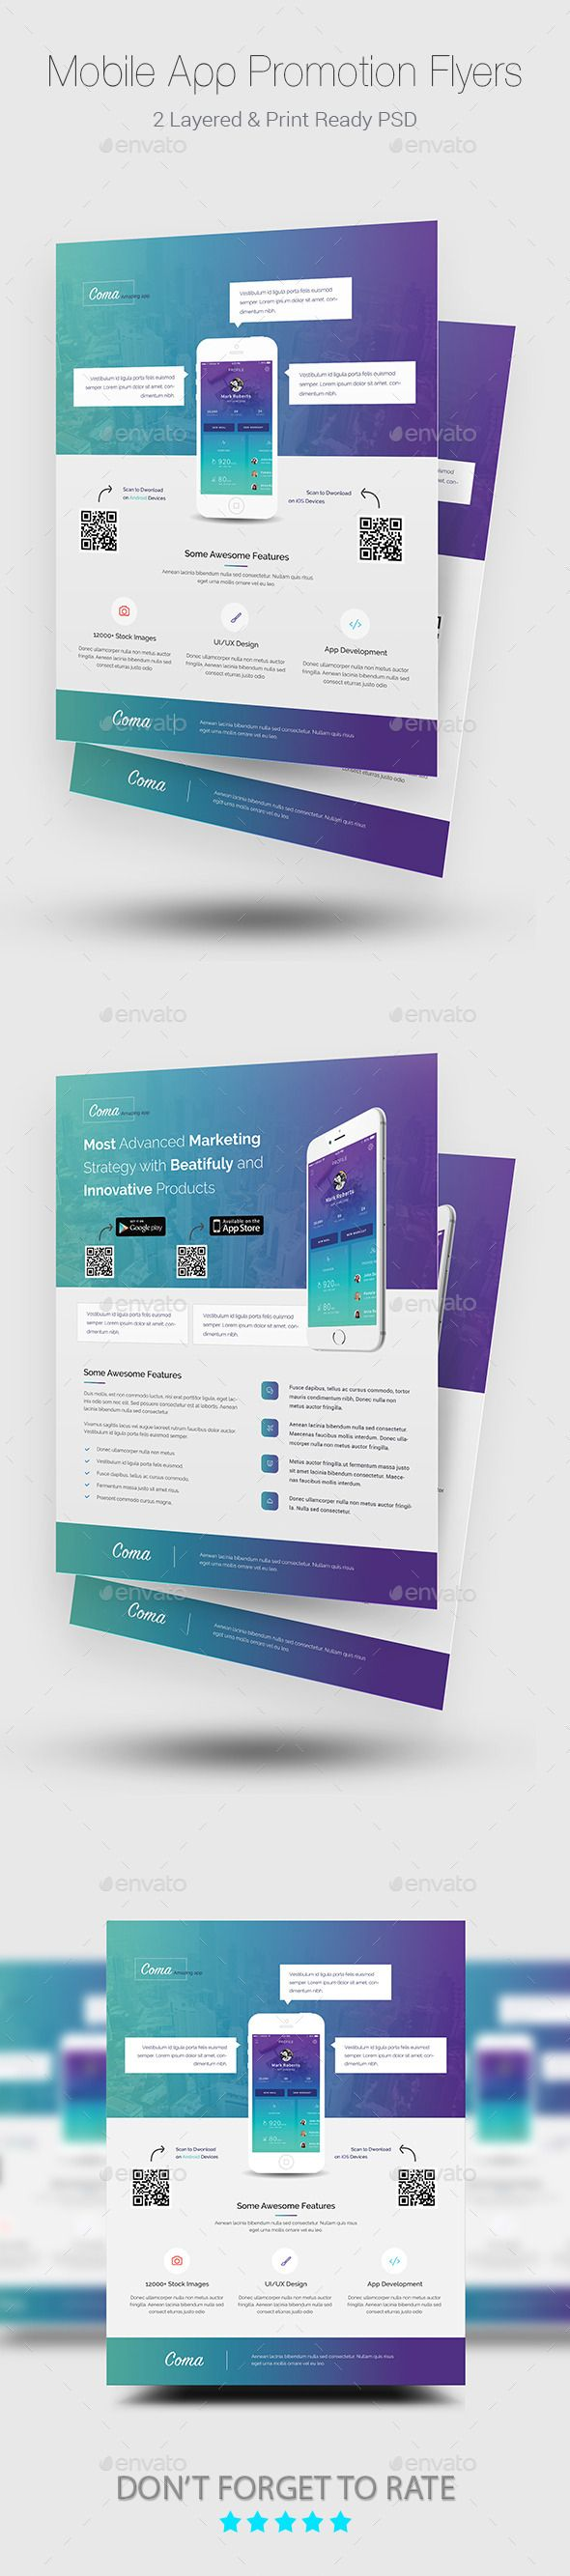 Mobile App Promotion Flyer Templates